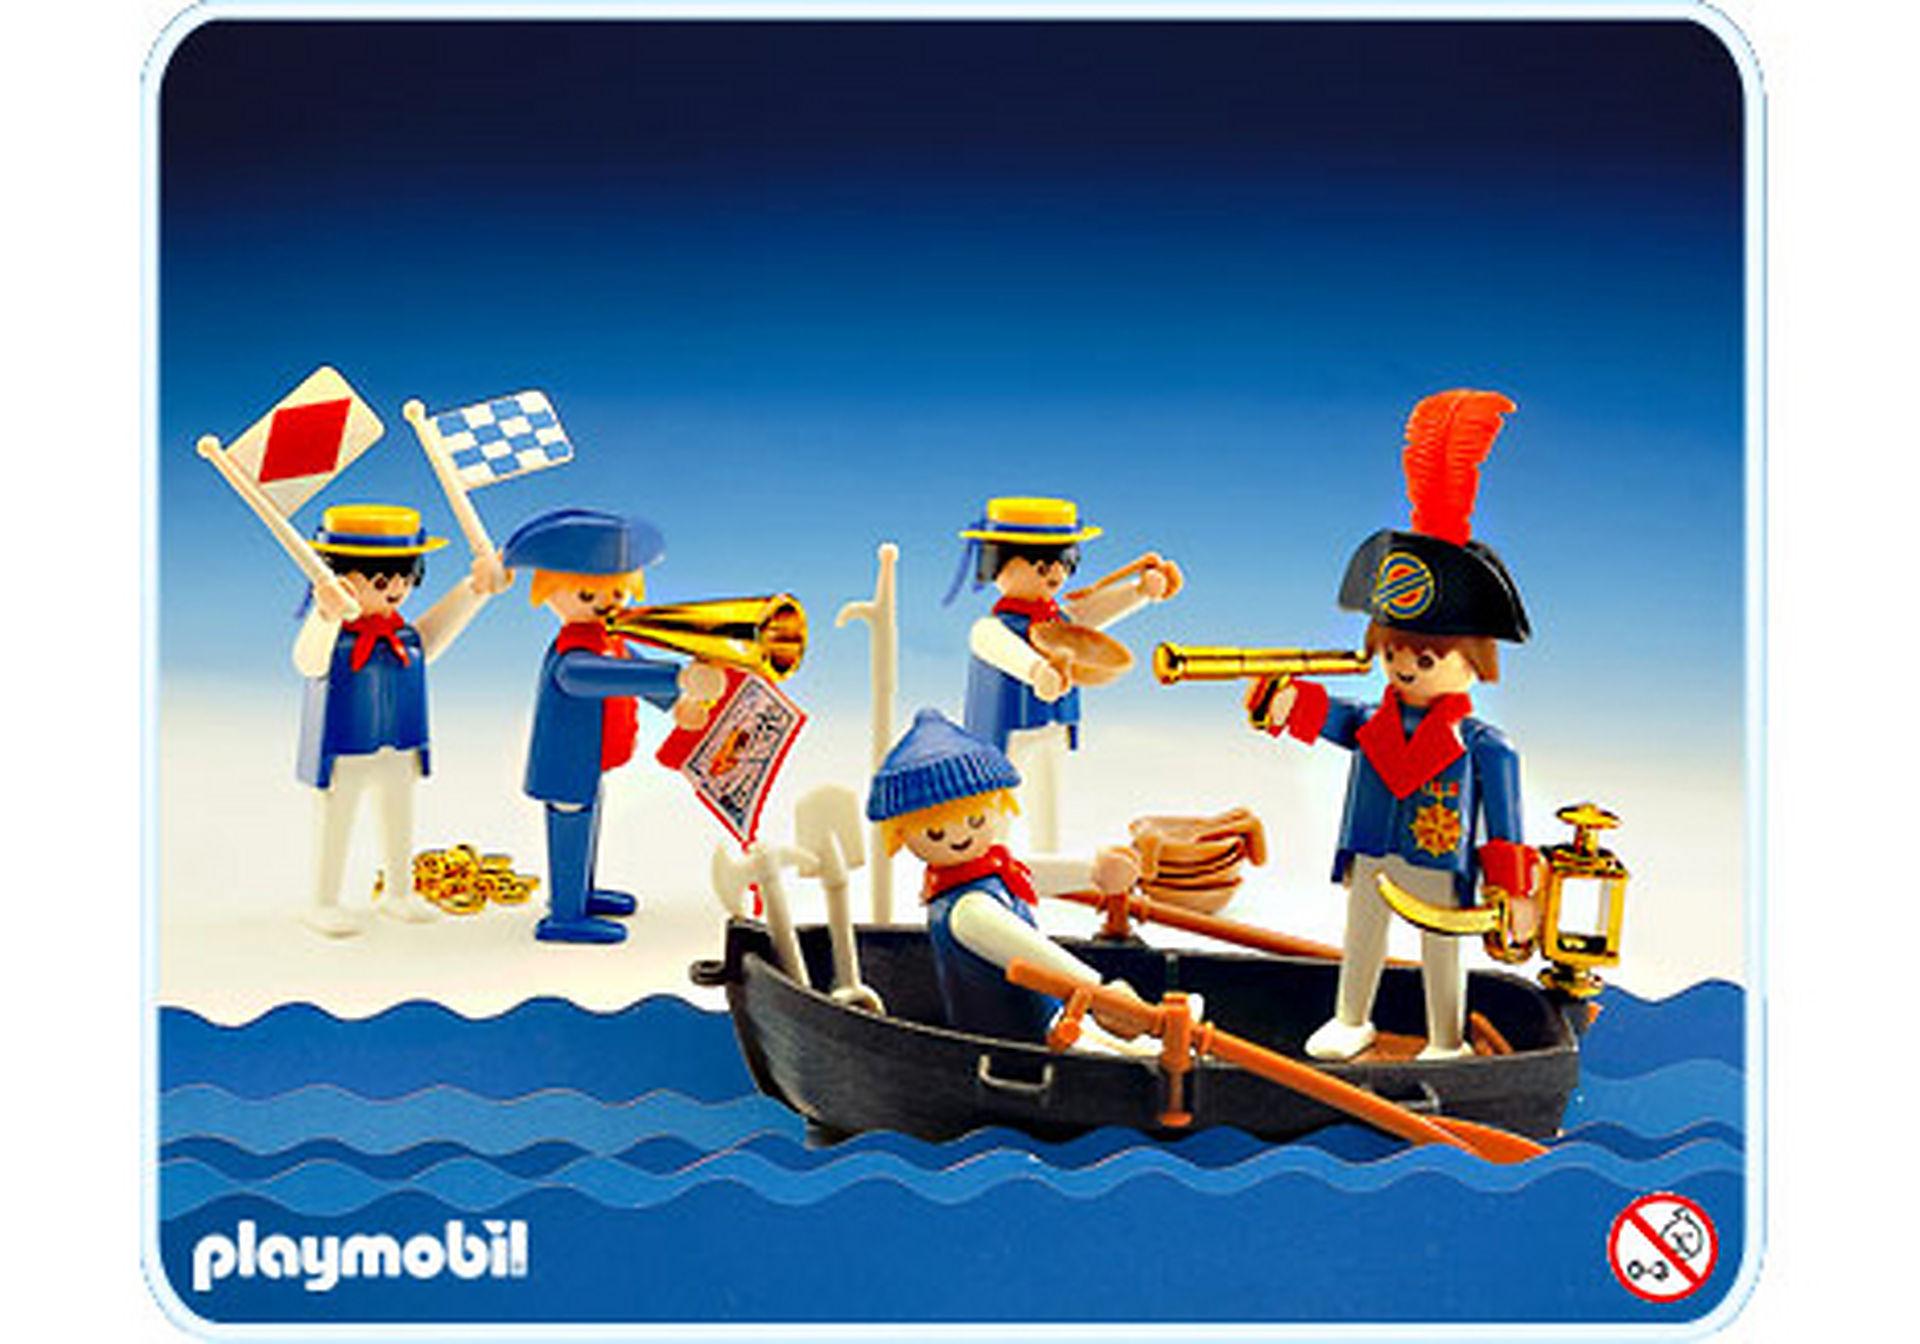 http://media.playmobil.com/i/playmobil/3546-B_product_detail/Seeleute